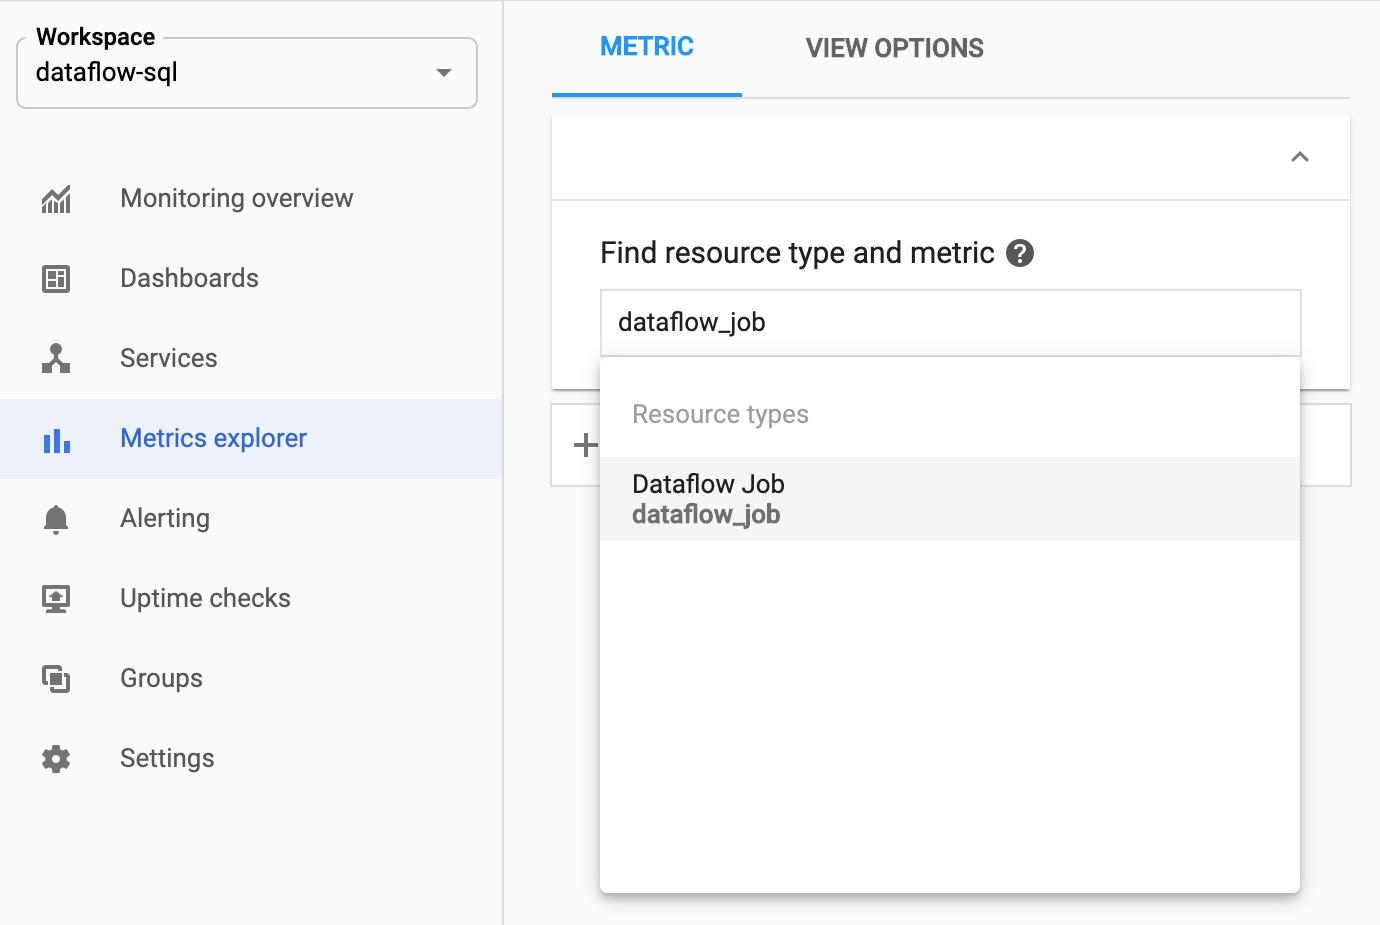 Selecting dataflow_job resource in the Metrics explorer.